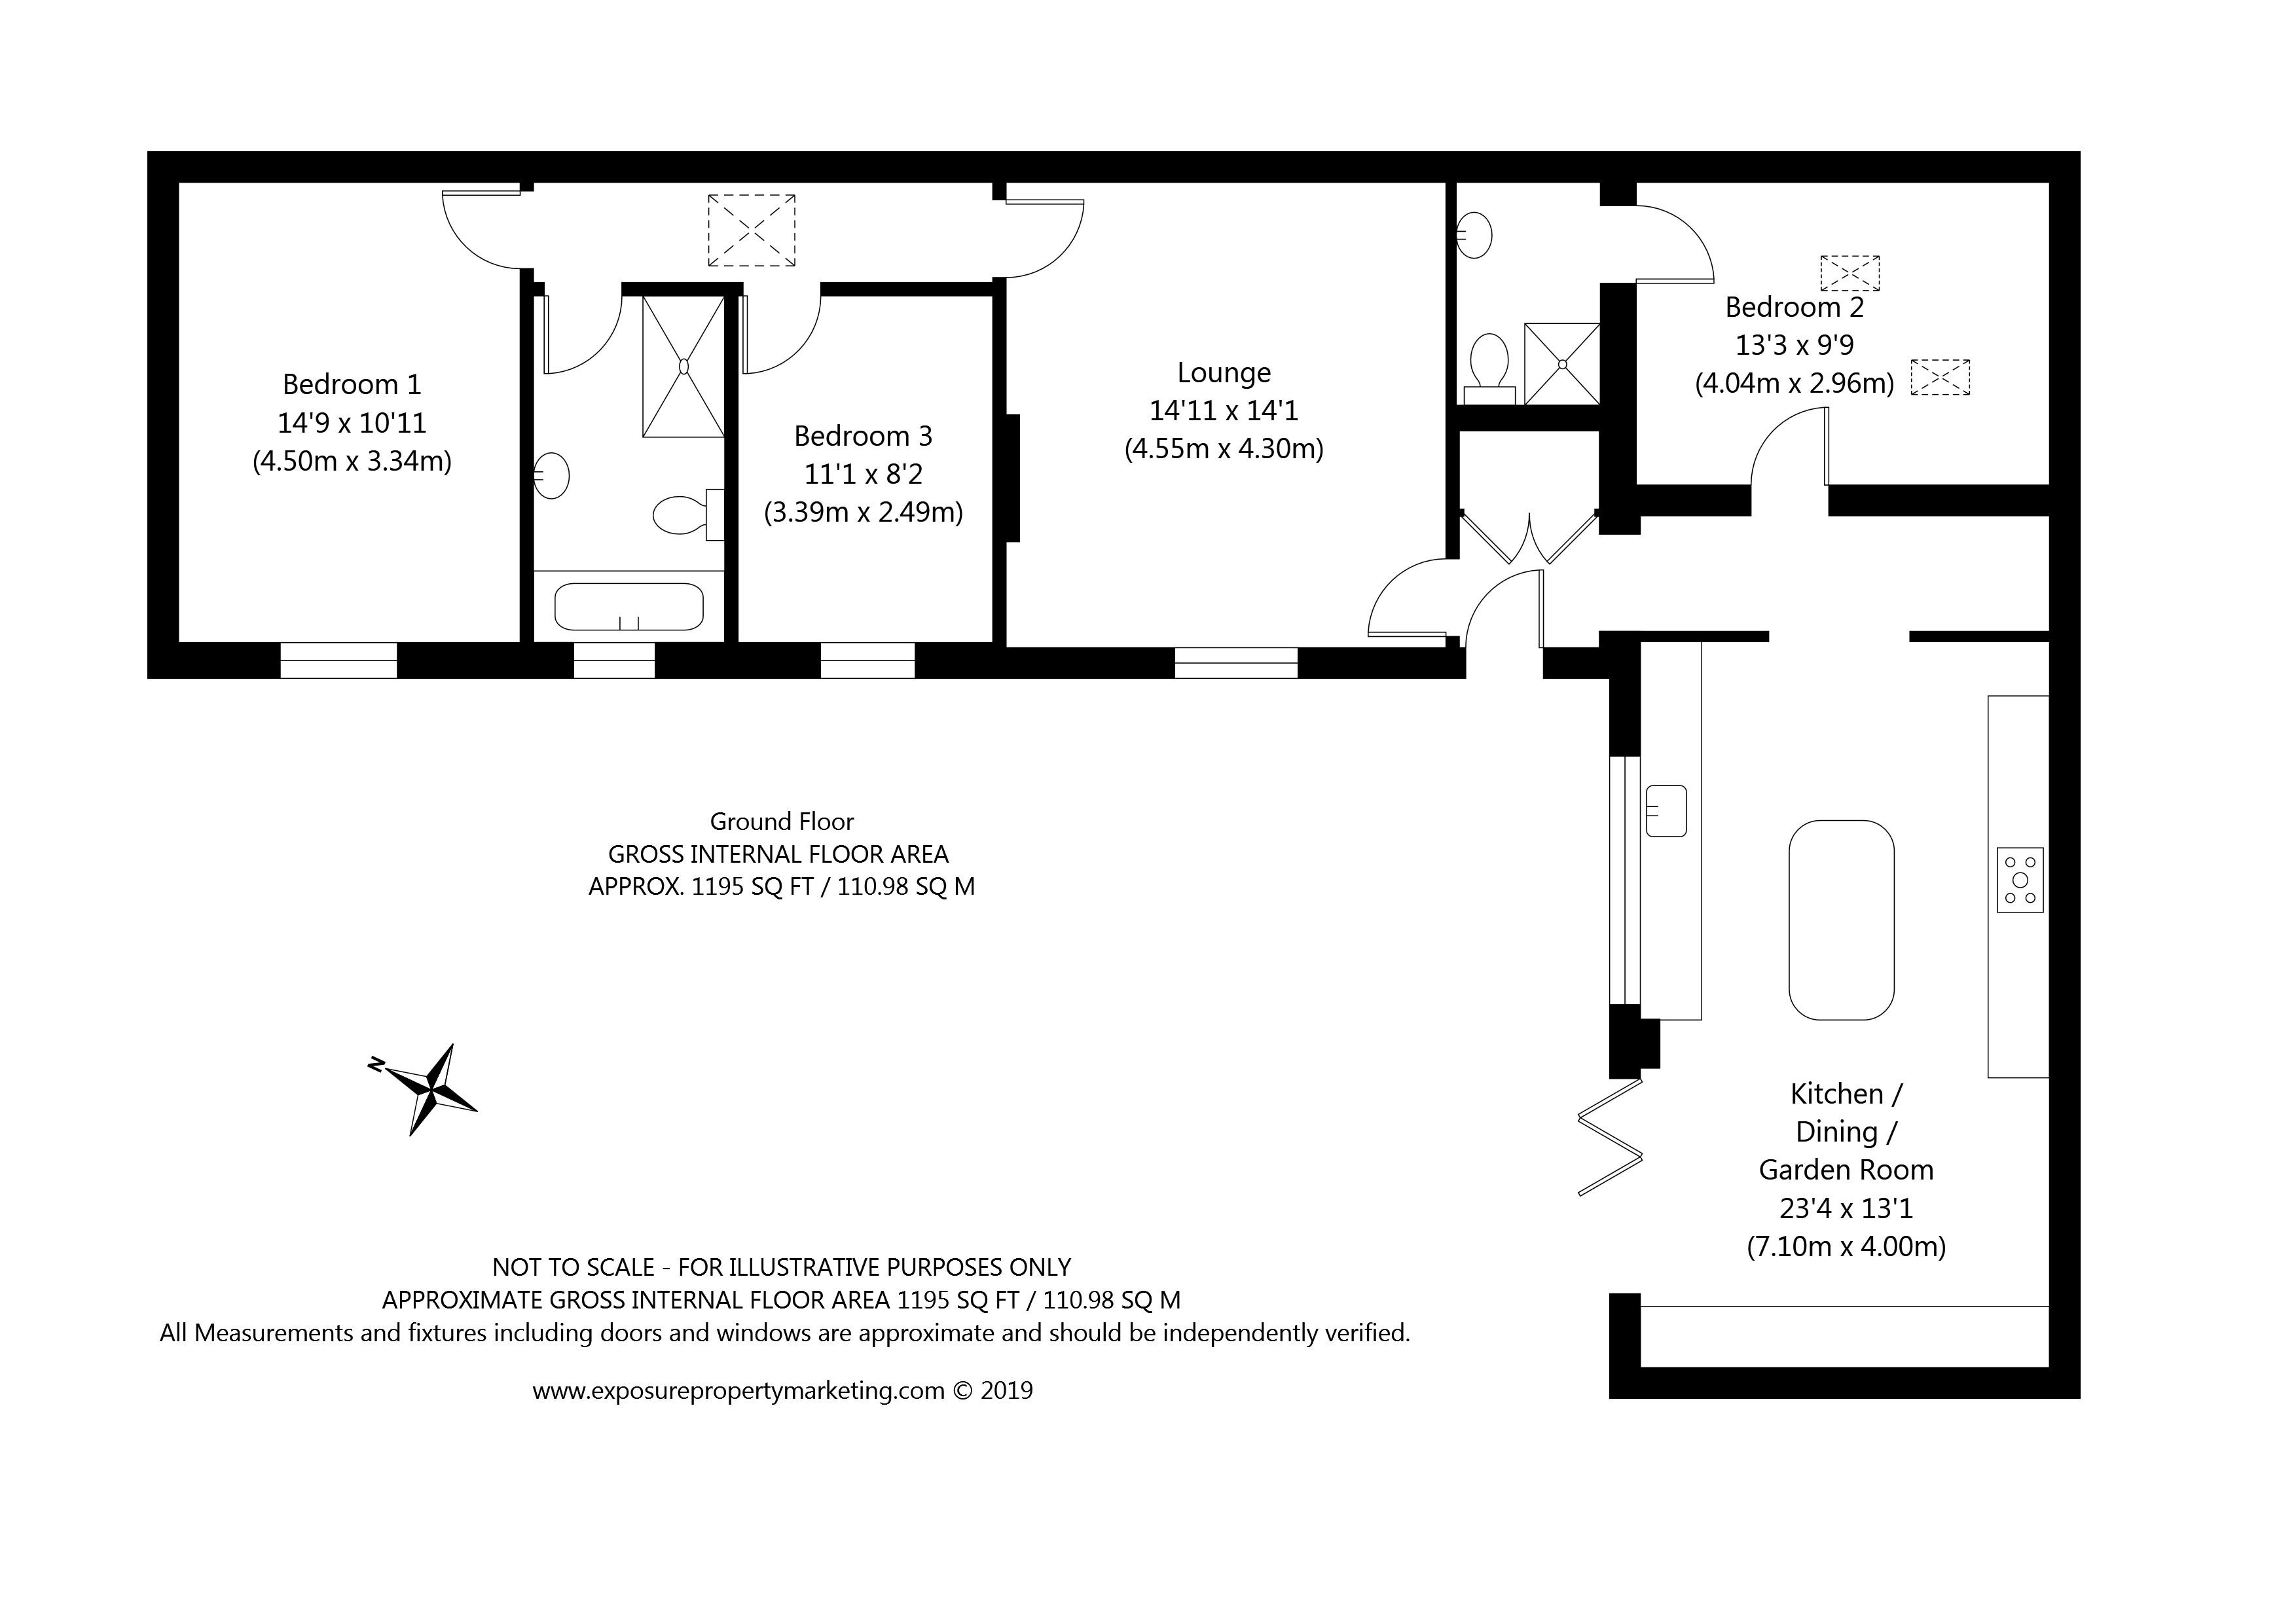 St Giles Road, Skelton, York property floorplan